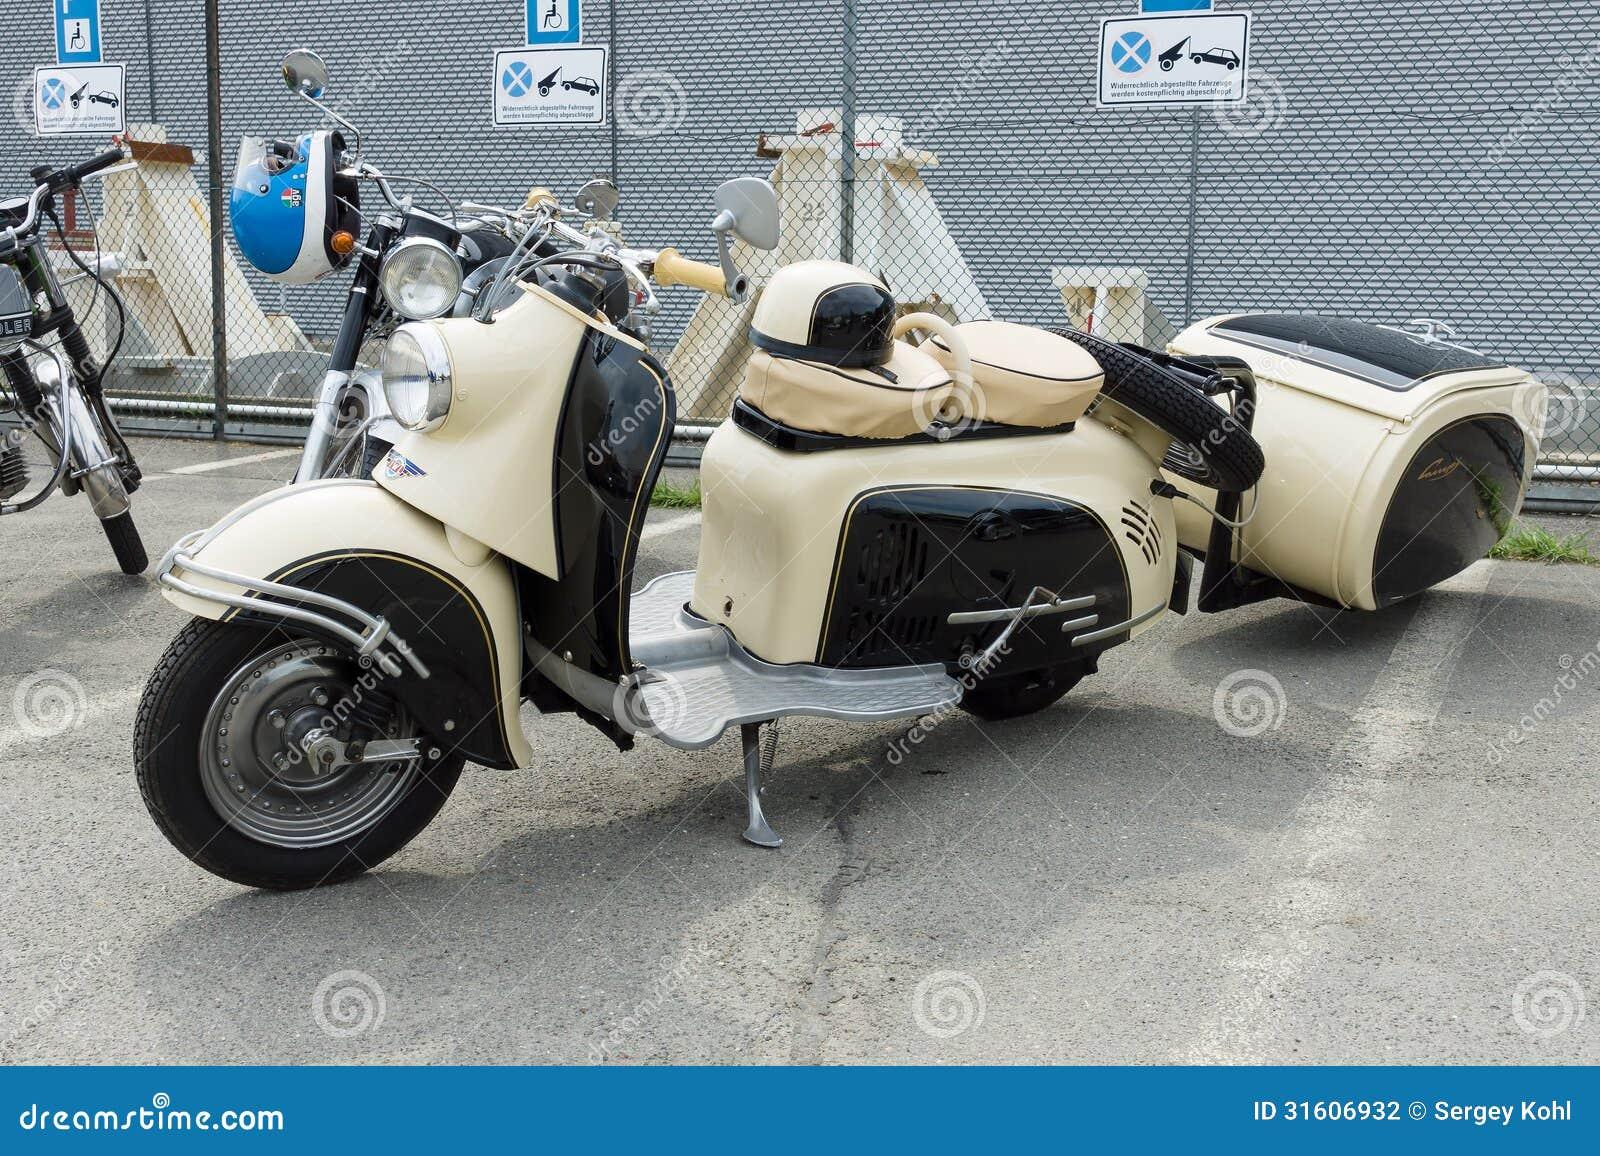 Len Design Berlin motor scooter sr 59 berlin with iwl stoye ci trailer editorial